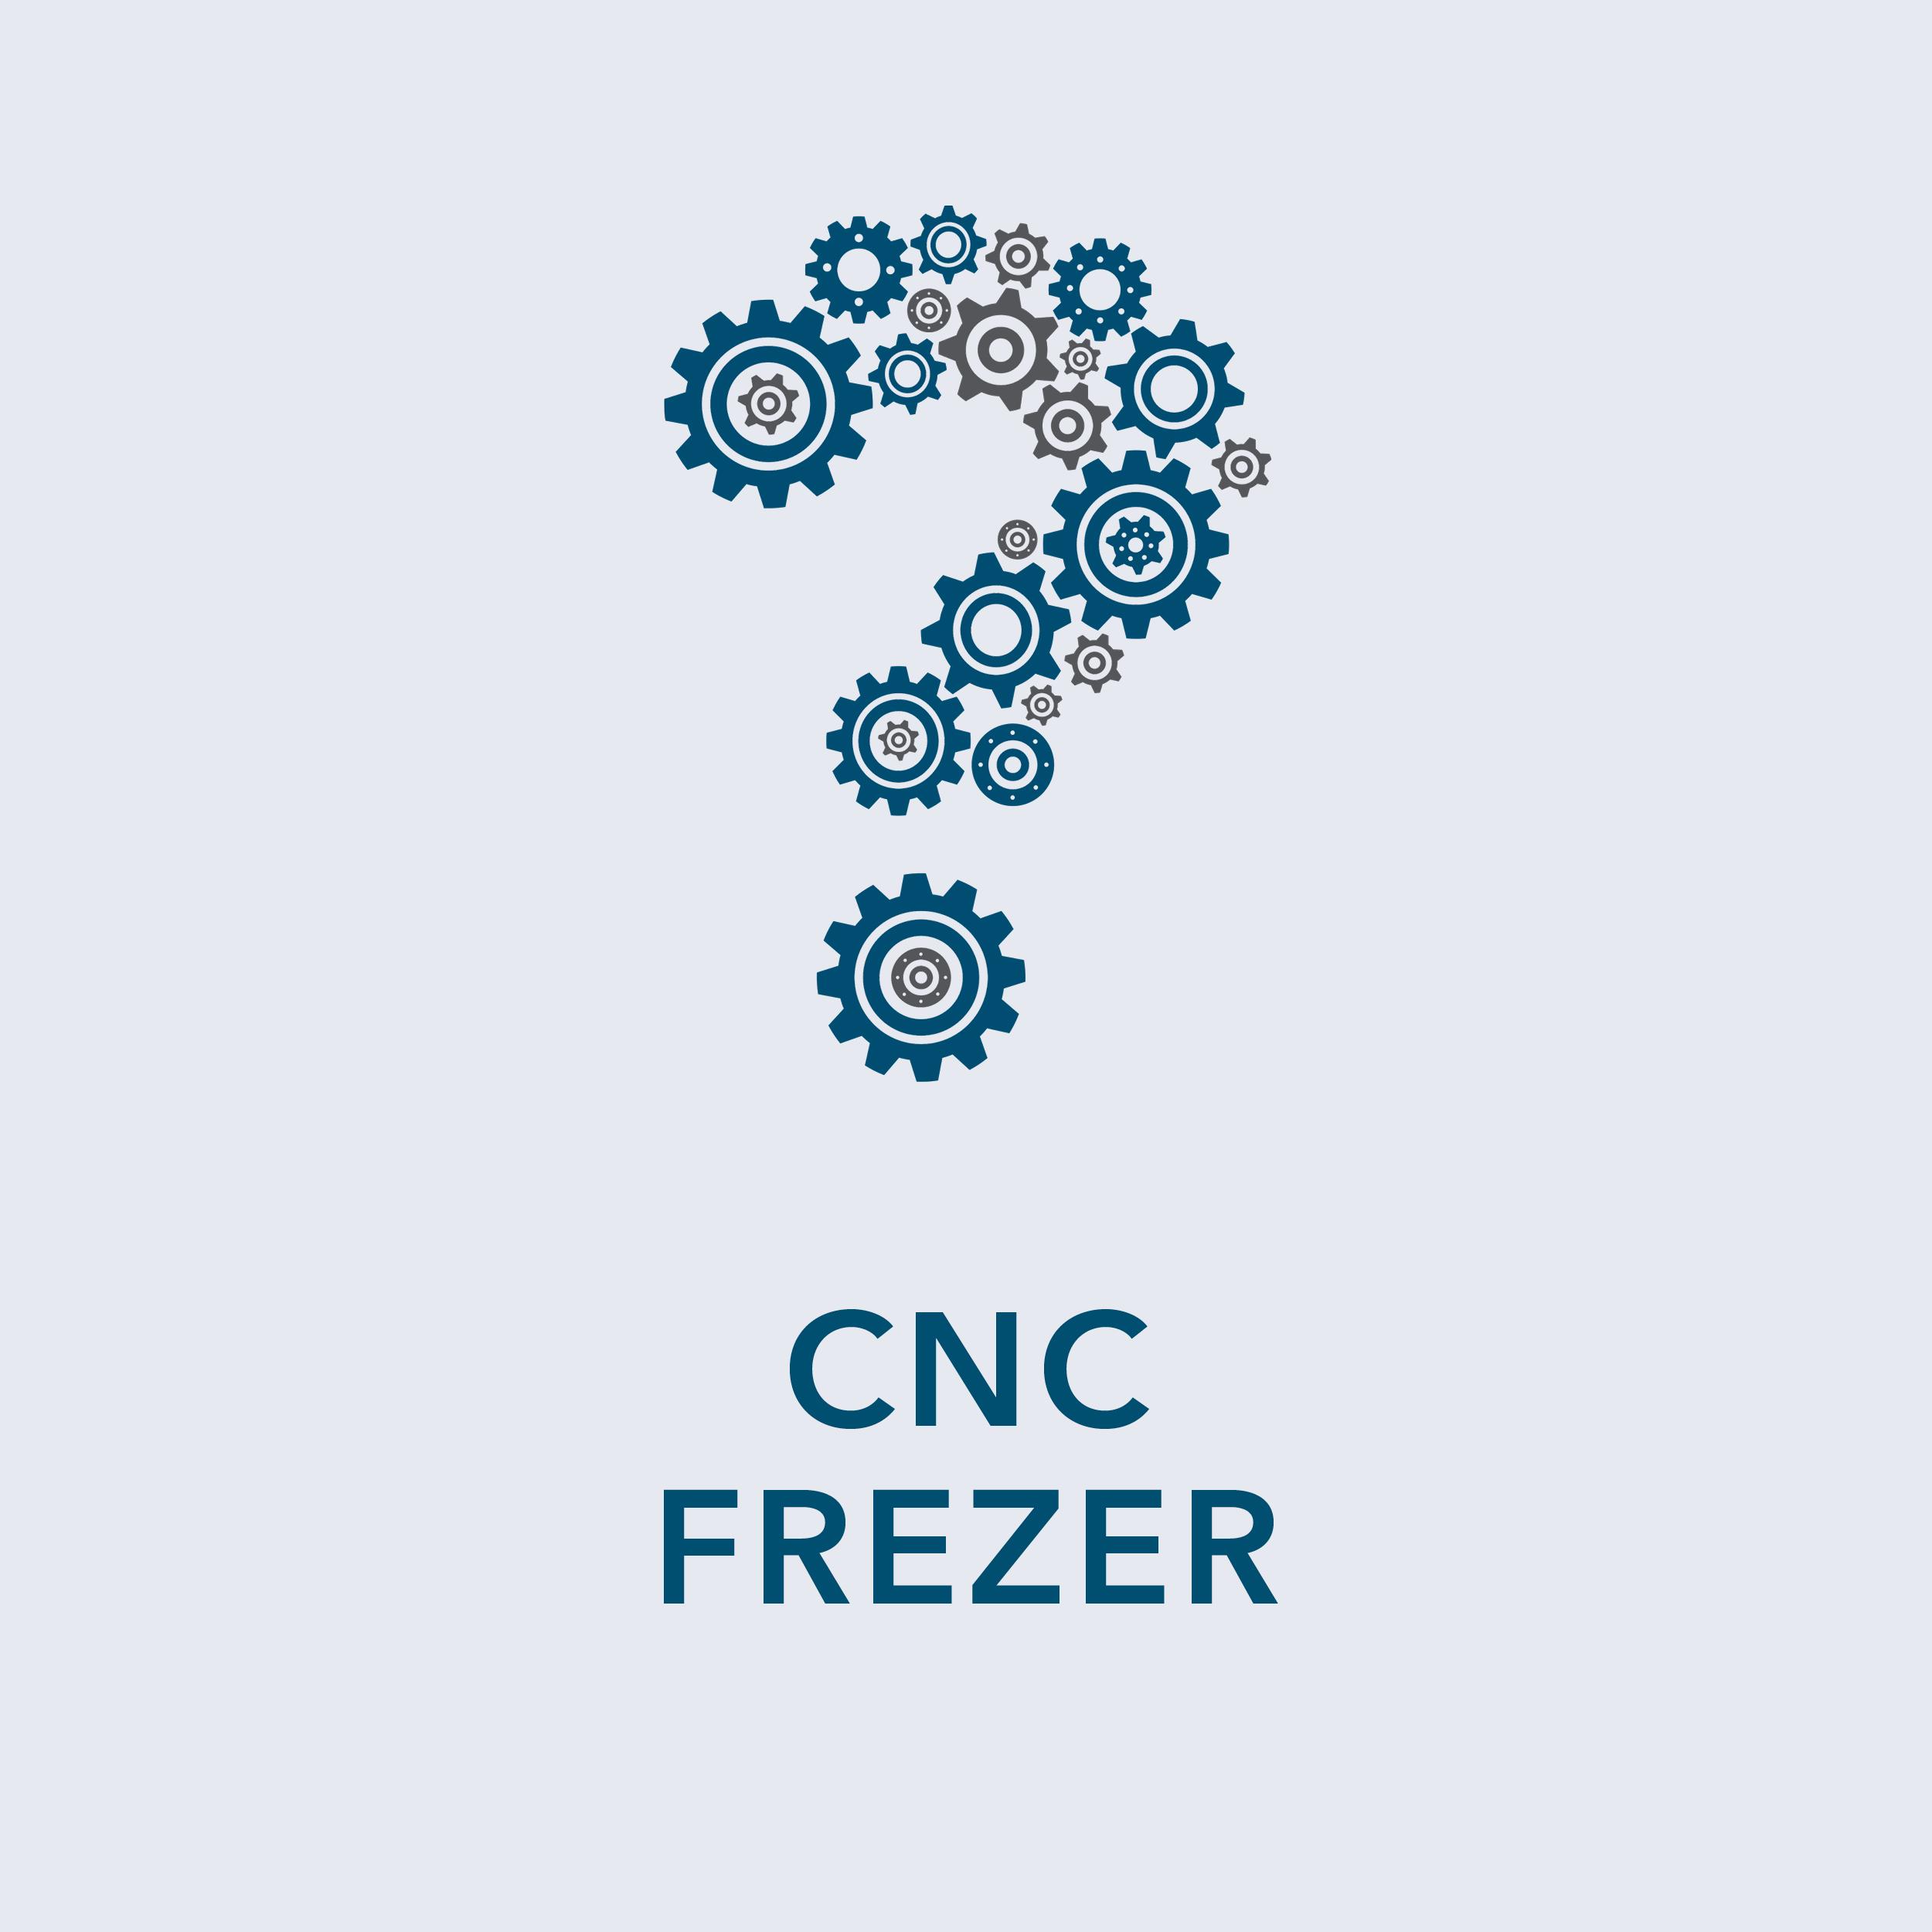 Gearcraft | CNC Frezer